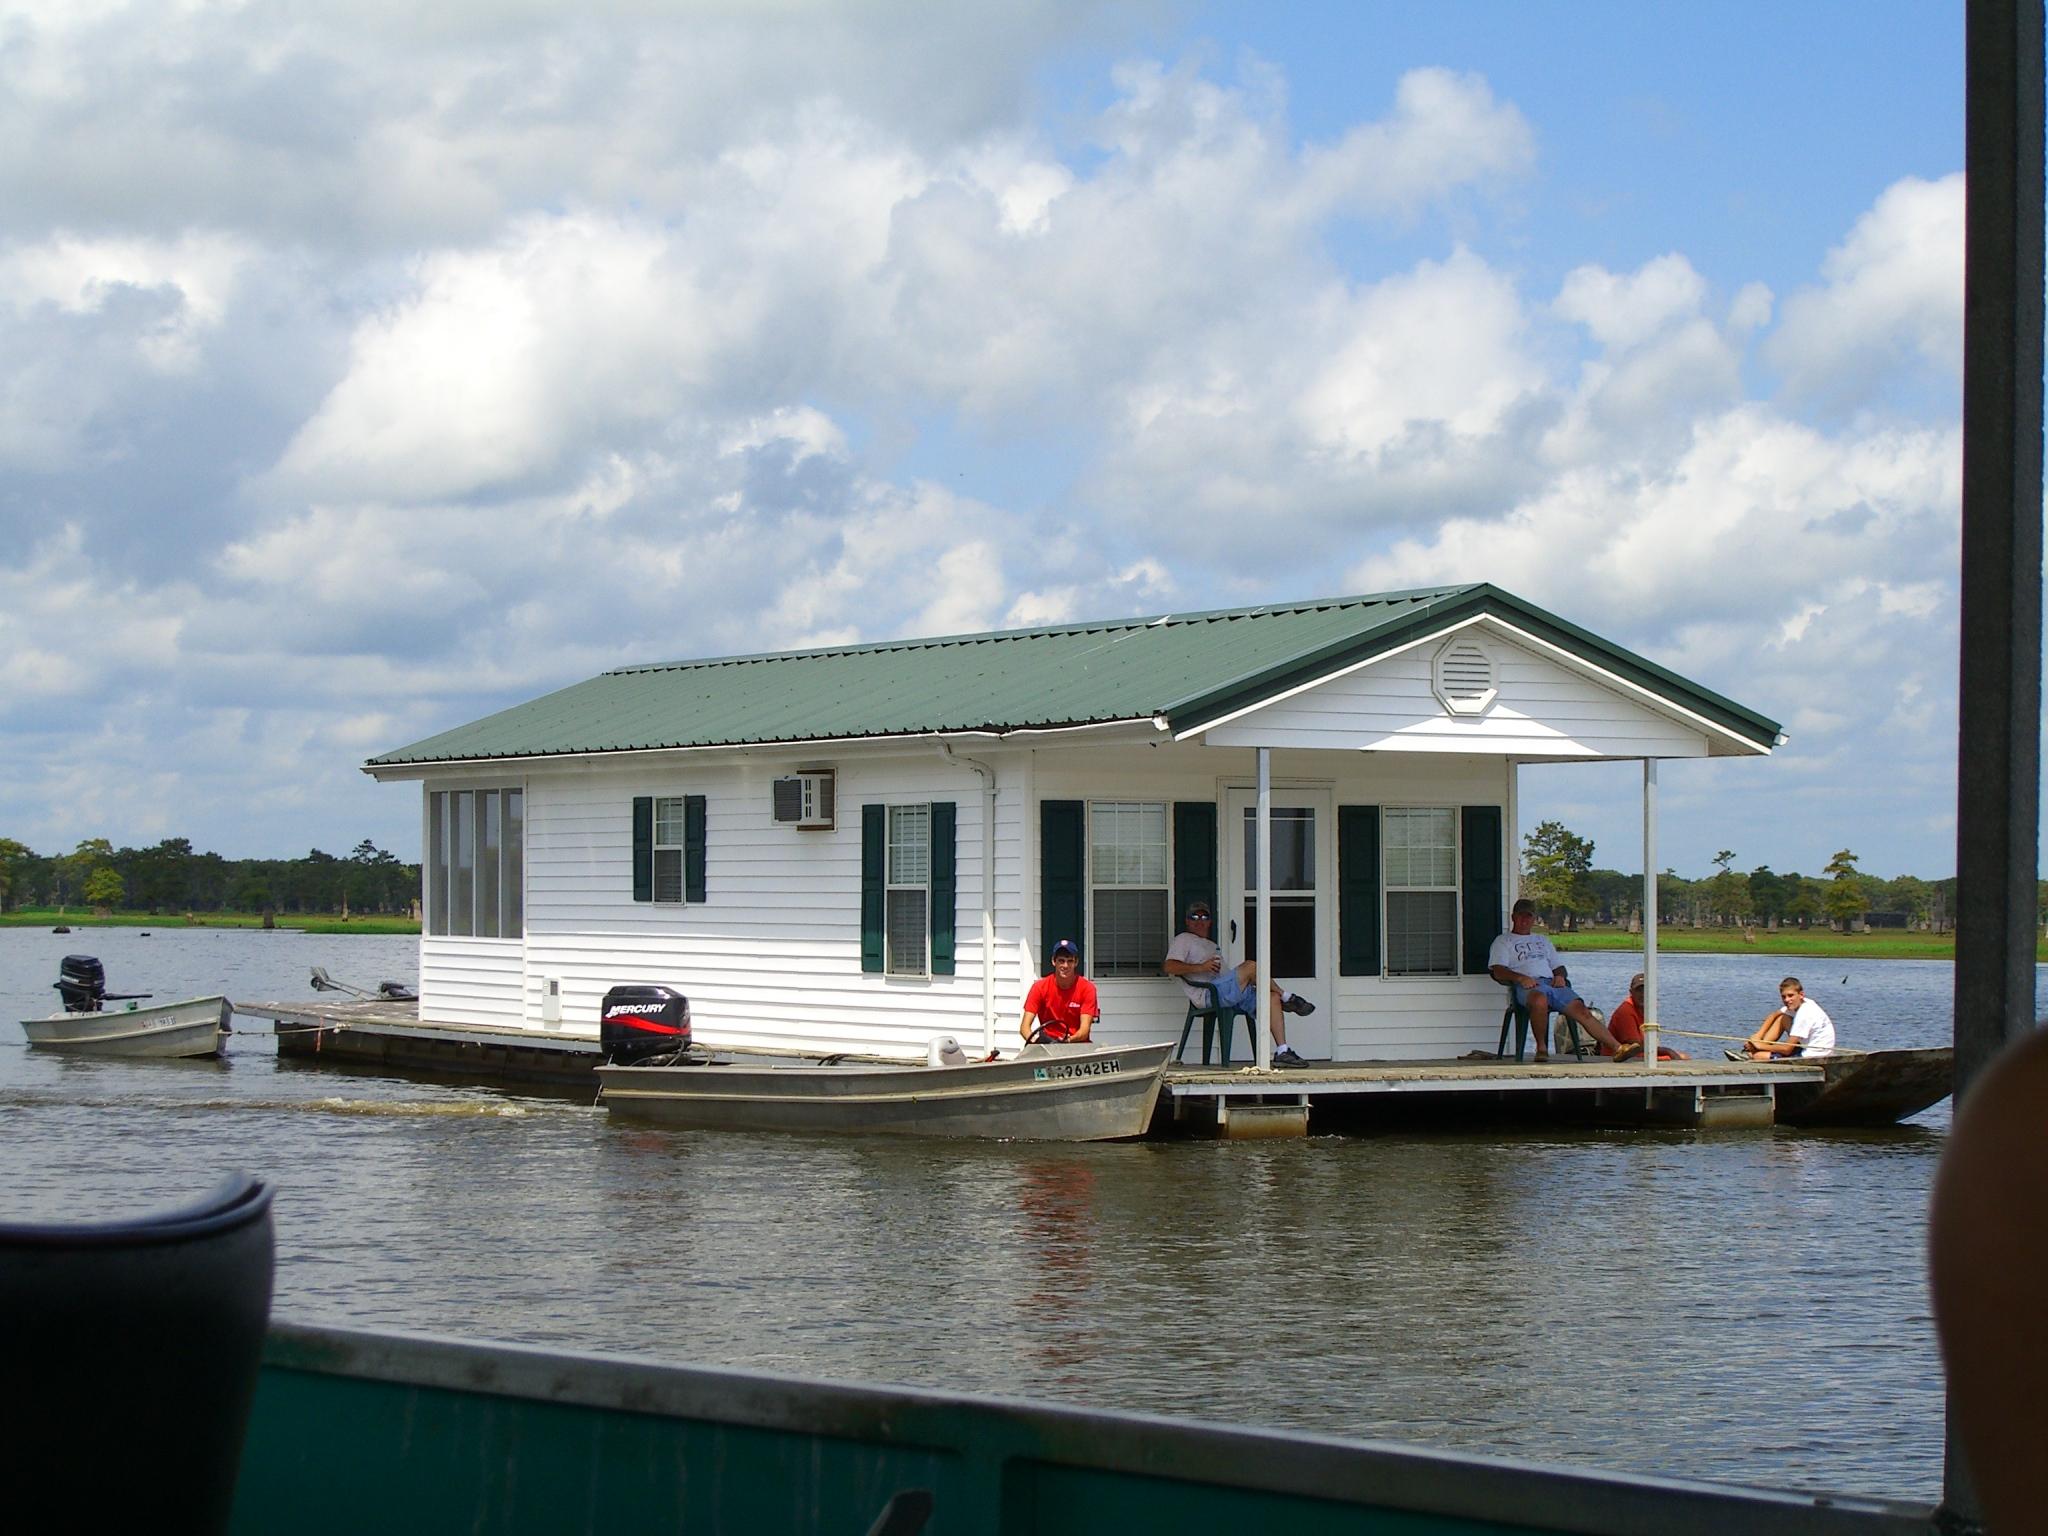 [Image: Lake_Bigeaux_houseboat.JPG]